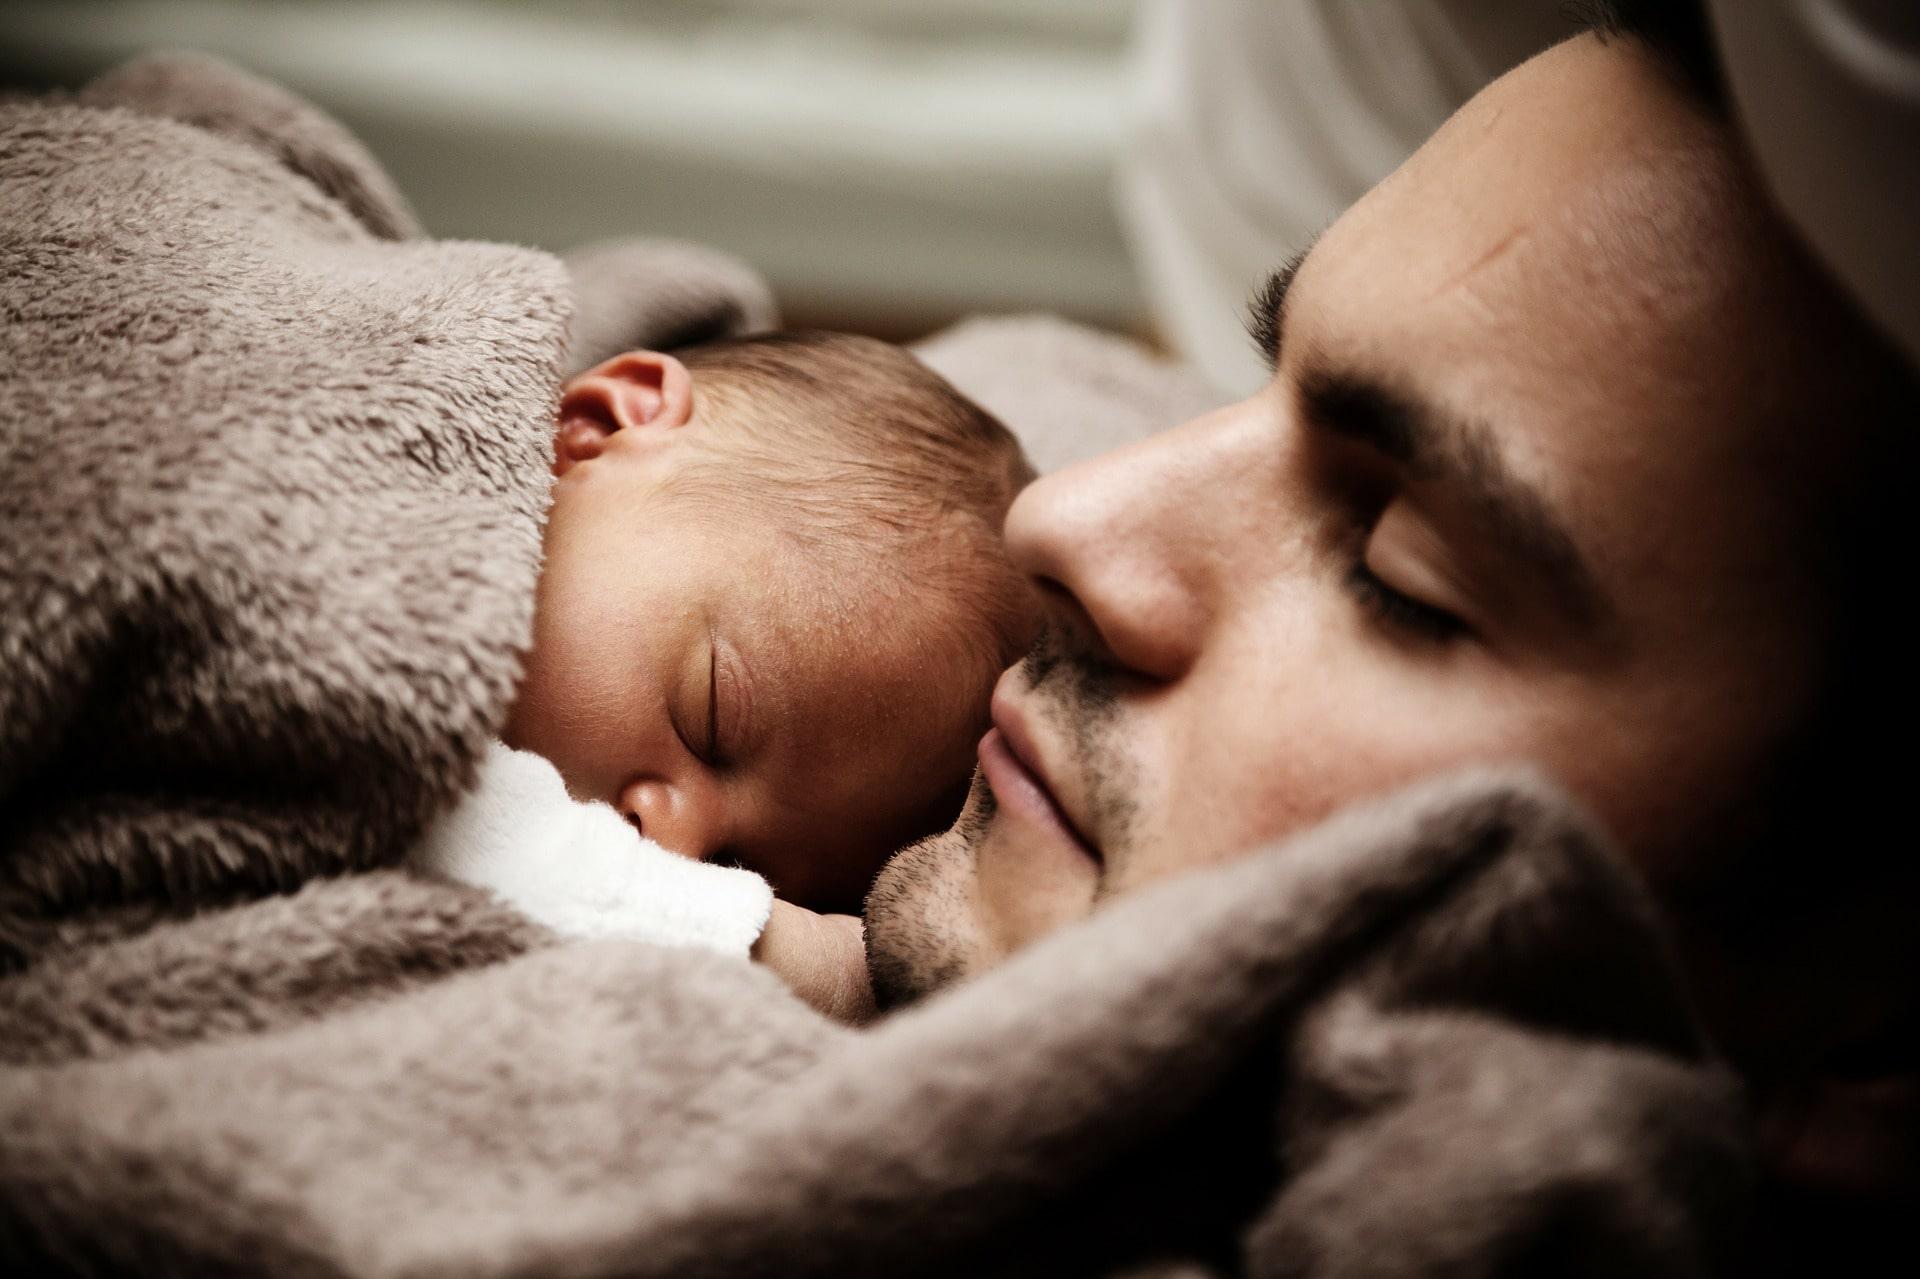 En pappa med en bebis på sig som sover.